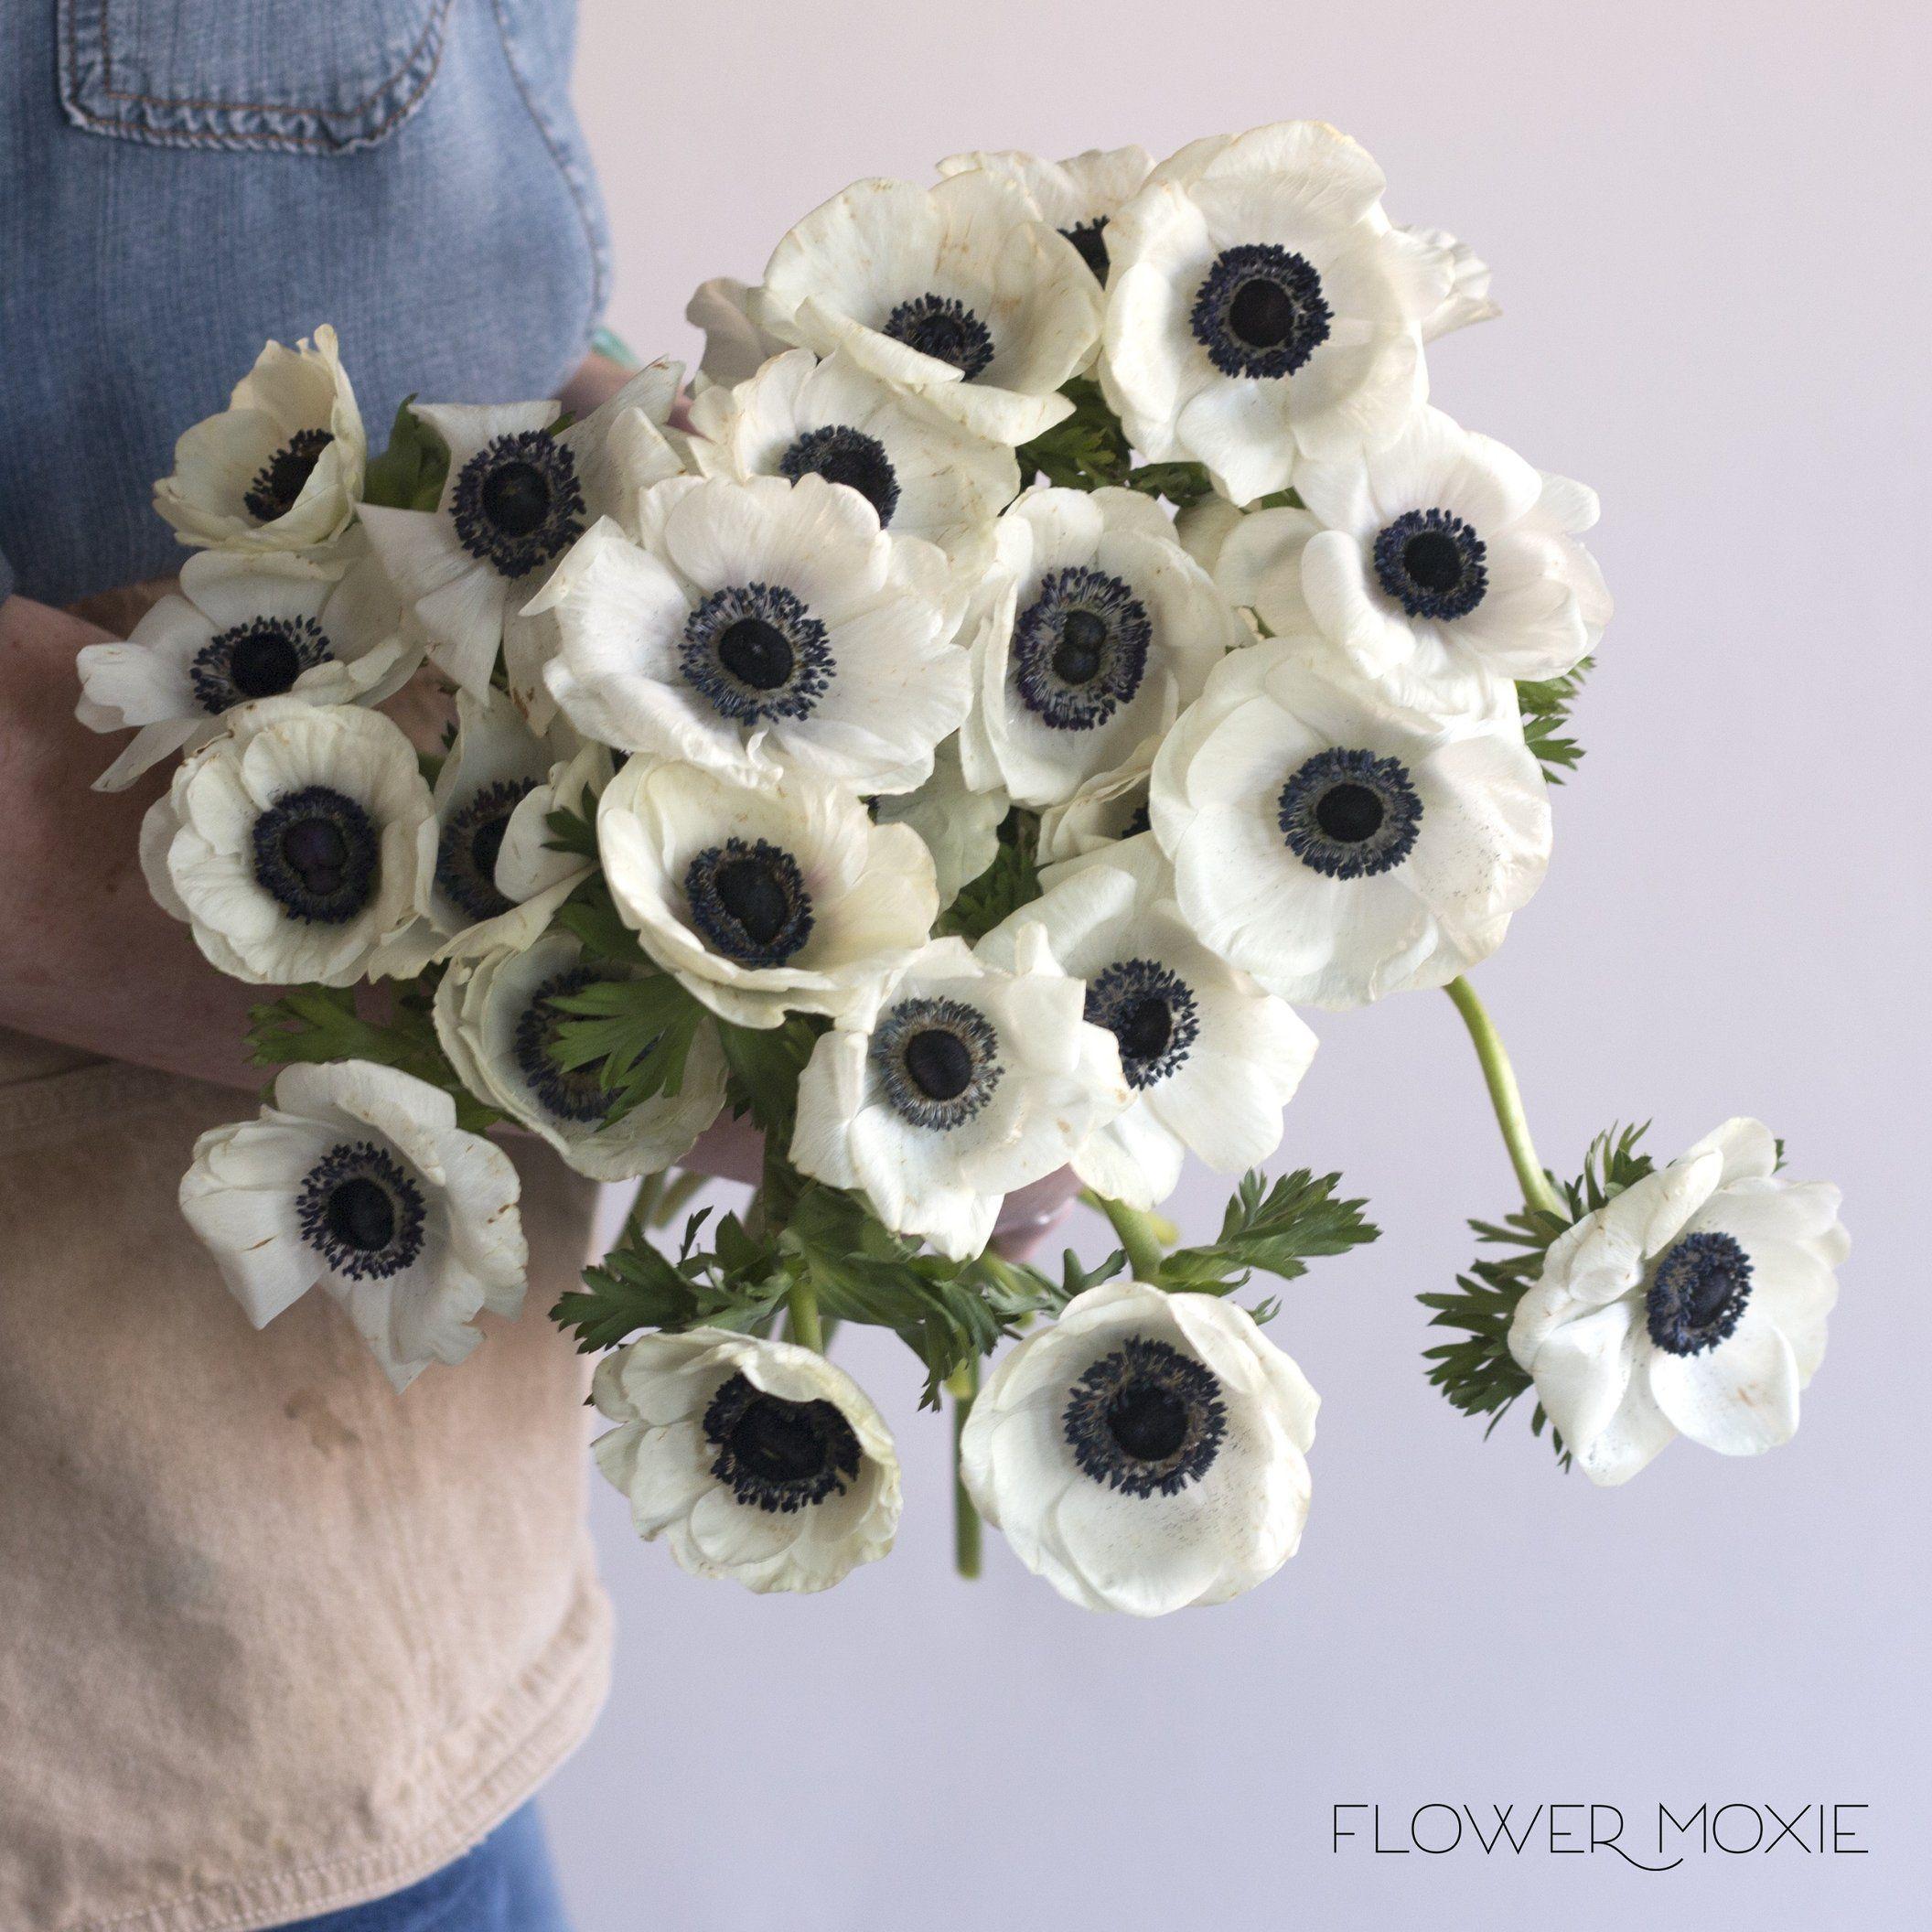 Anemone White Diyflowers Diyweddingflowers Affordableflowers Weddingaffordable Doityourselfflowers Di White Anemone Flower Anemone Flower White Anemone